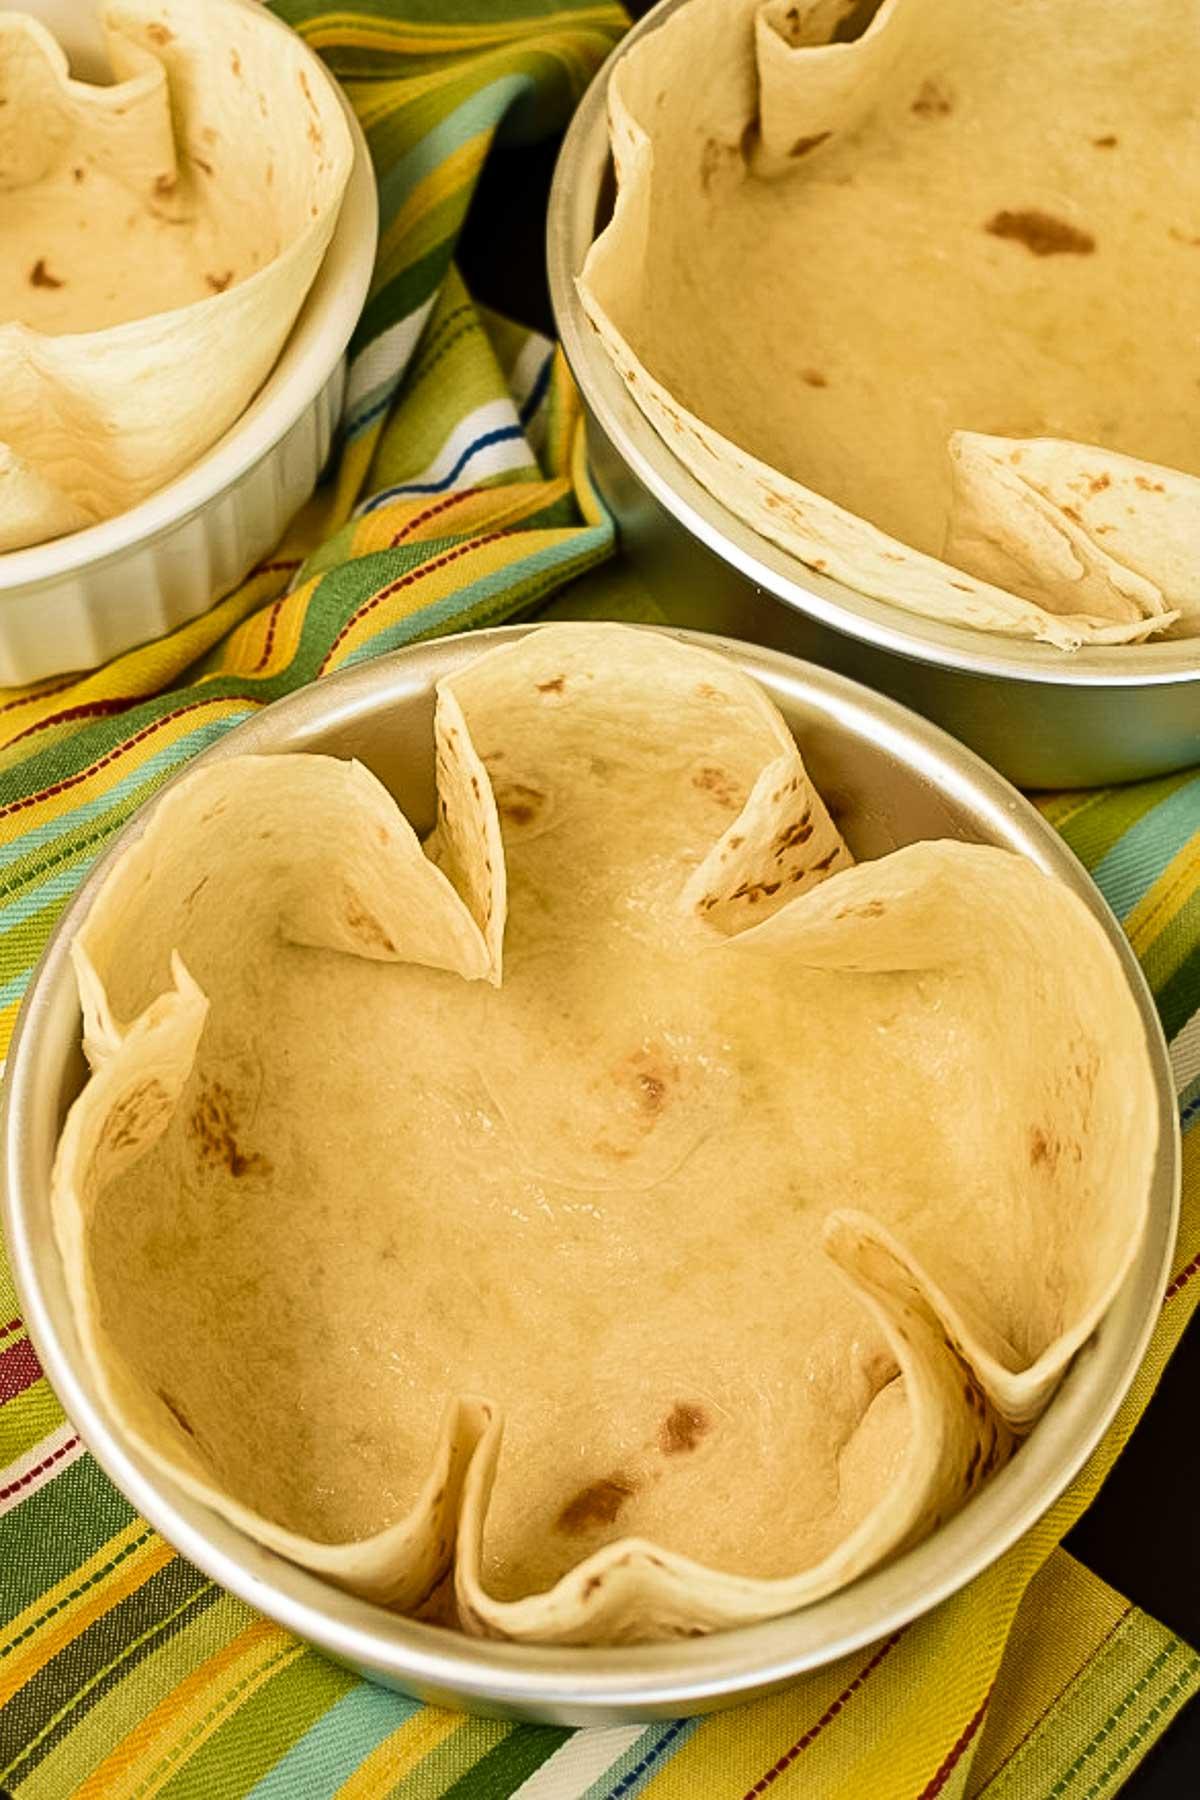 Oven-safe bowls with a flour tortilla.